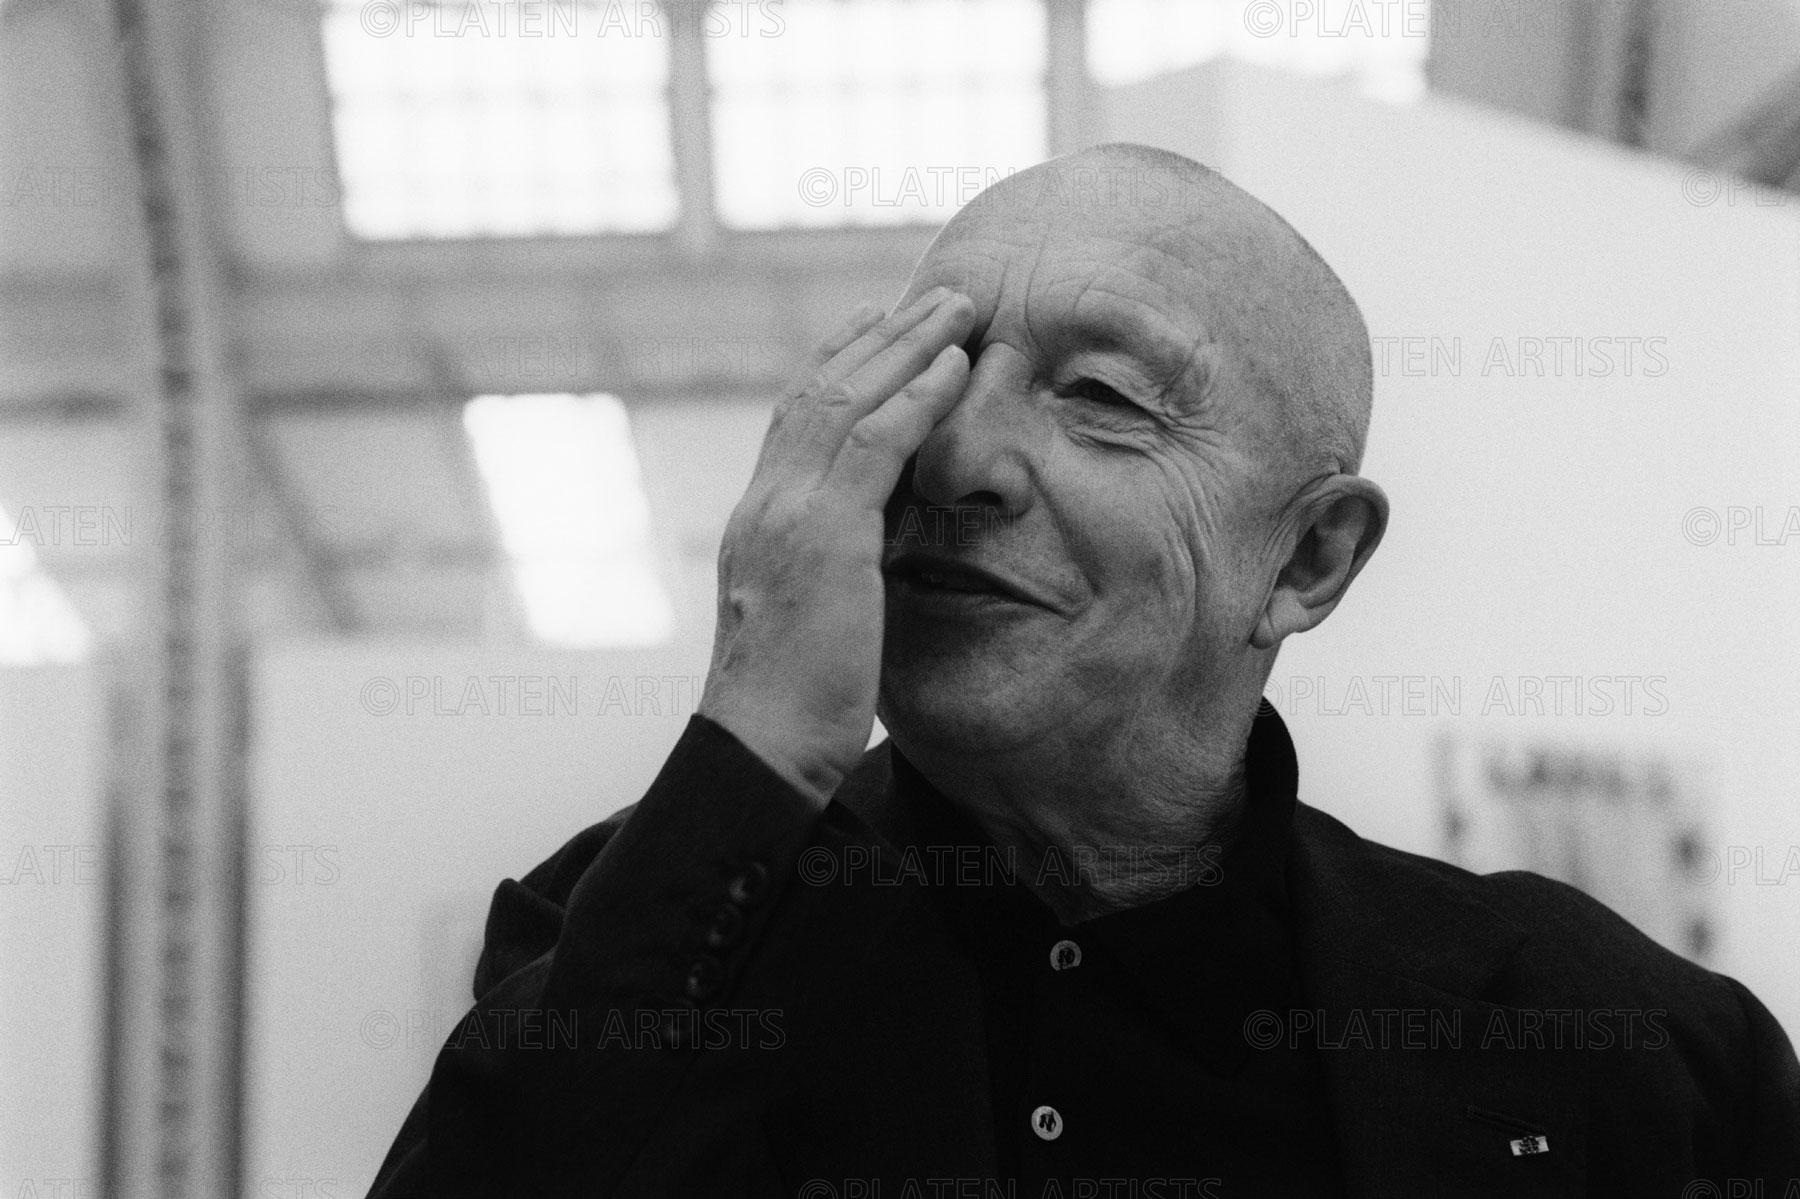 Georg Baselitz, Halbsicht, Hamburg, 2008